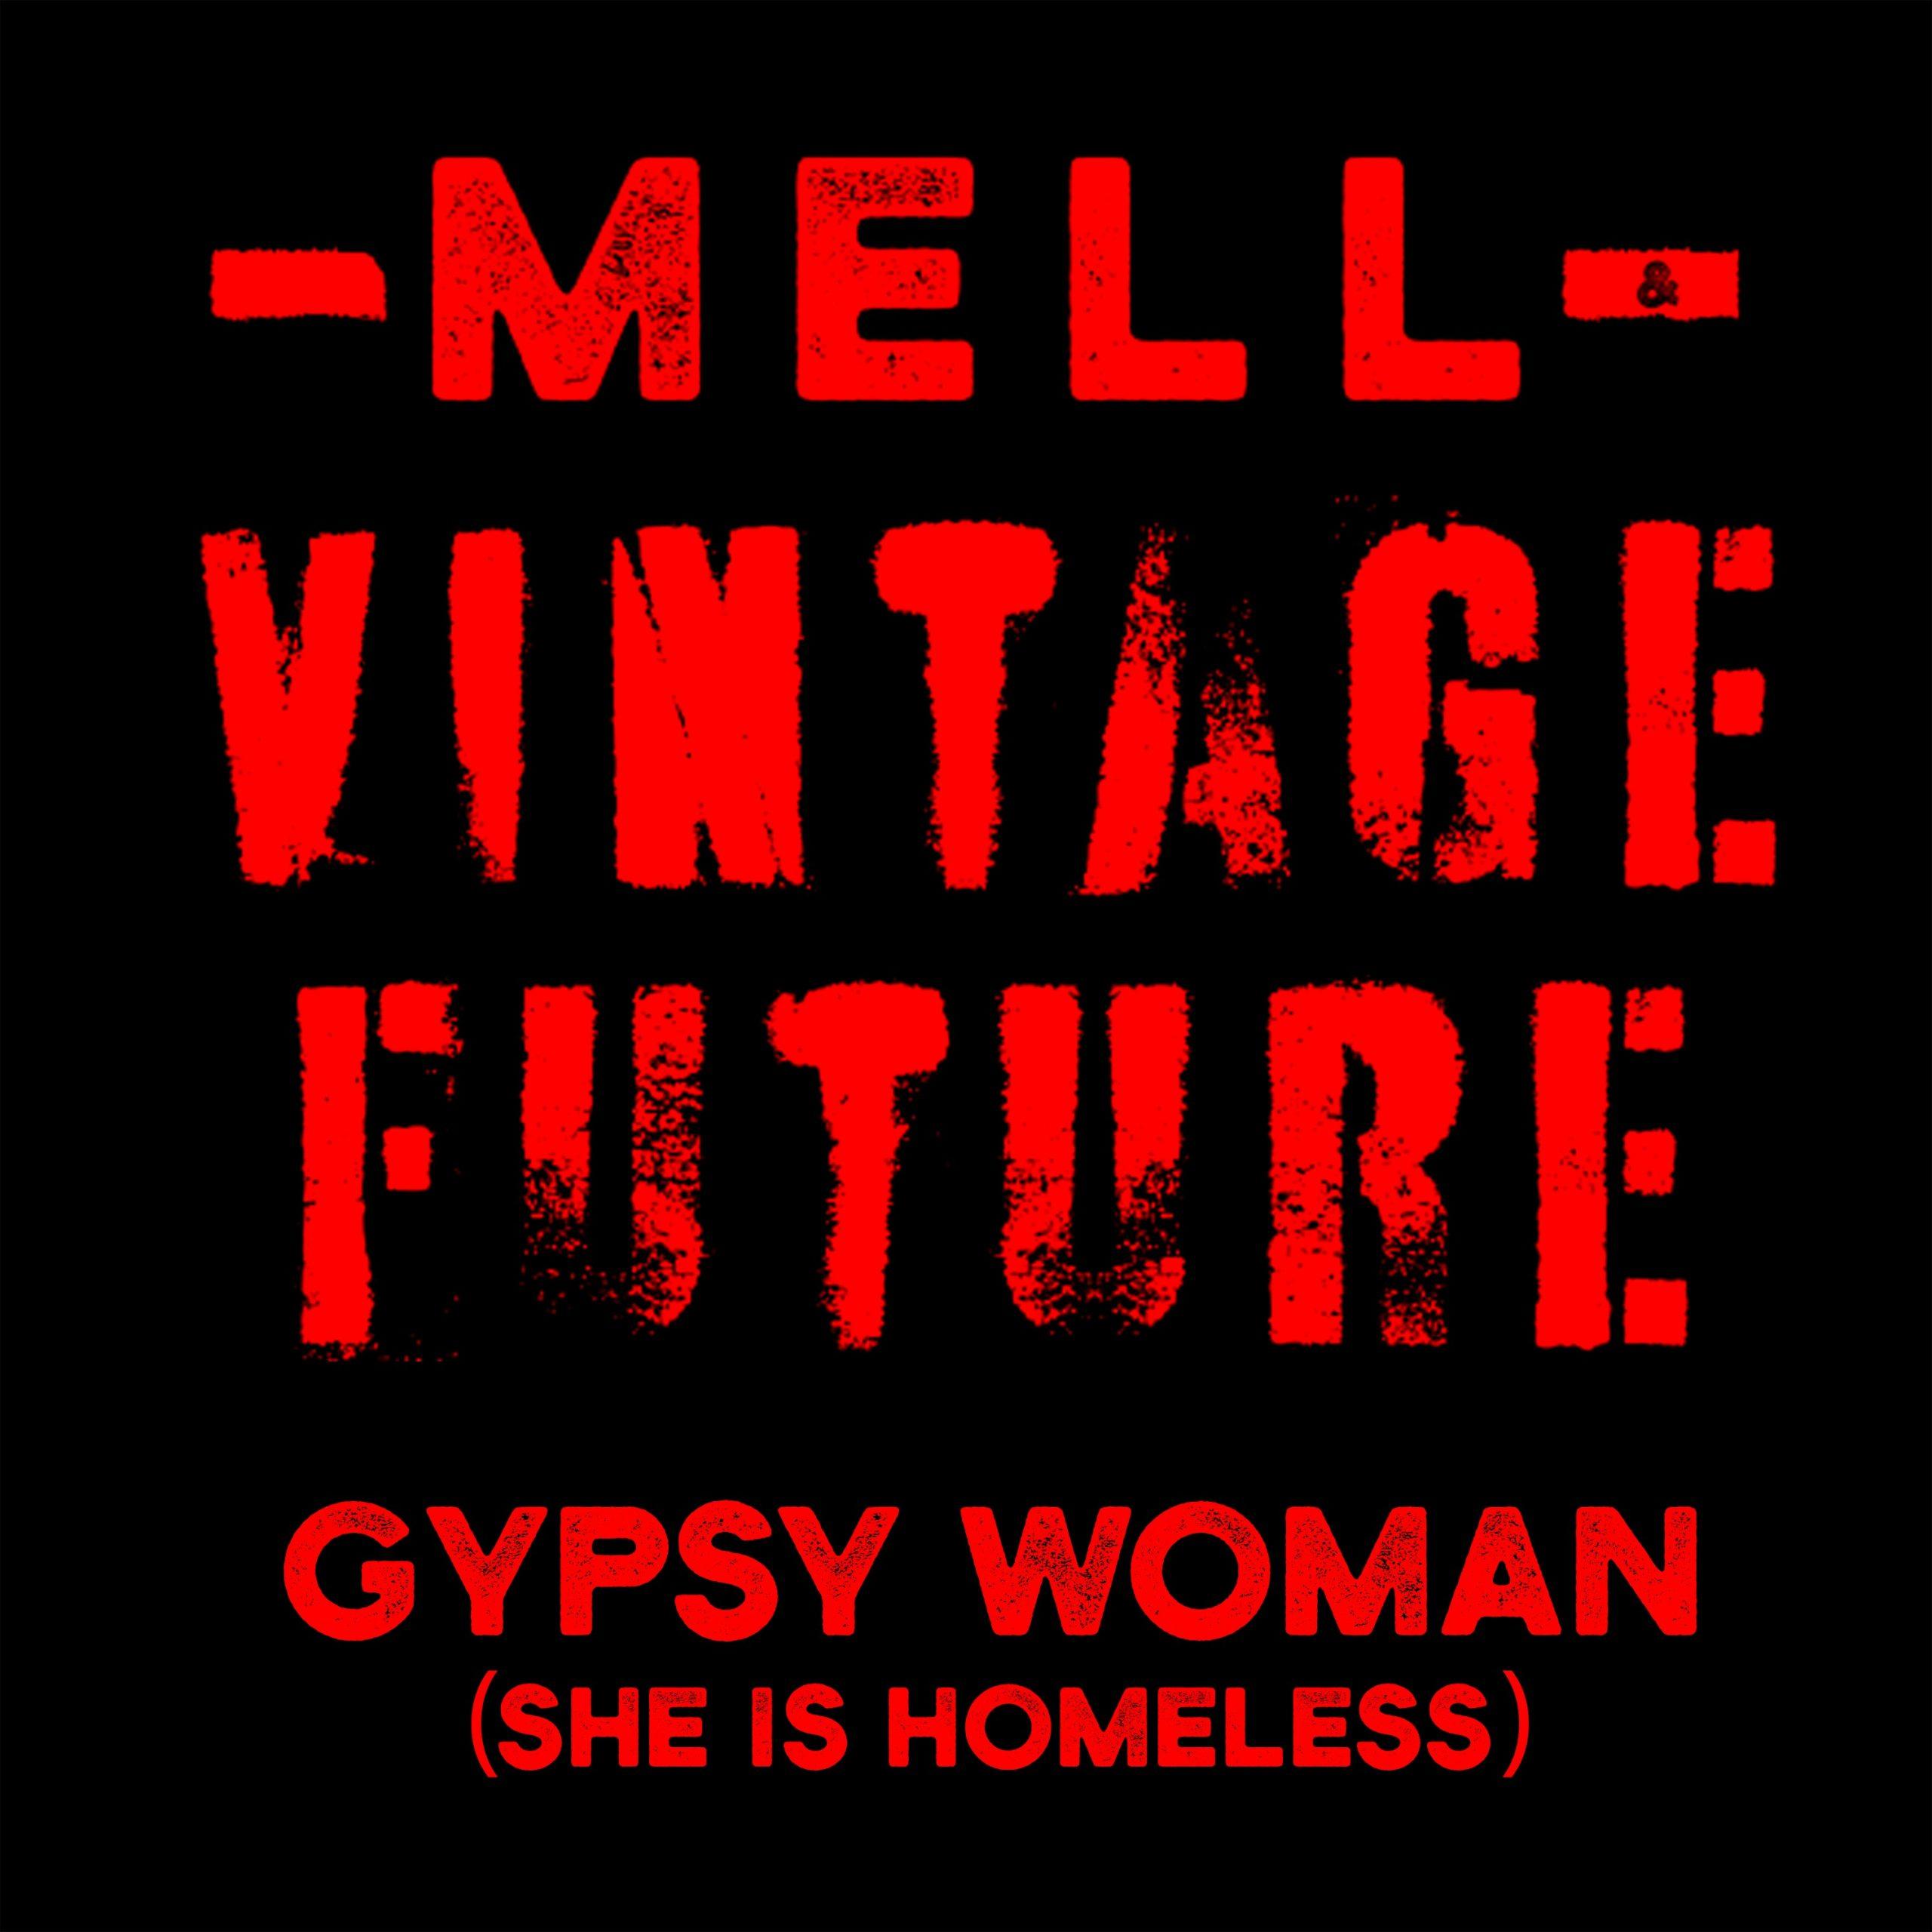 Mell & Vintage Future brengen nieuwe versie uit van Gypsy Woman. - Hoes Mell Vintage Future Gypsy Woman scaled